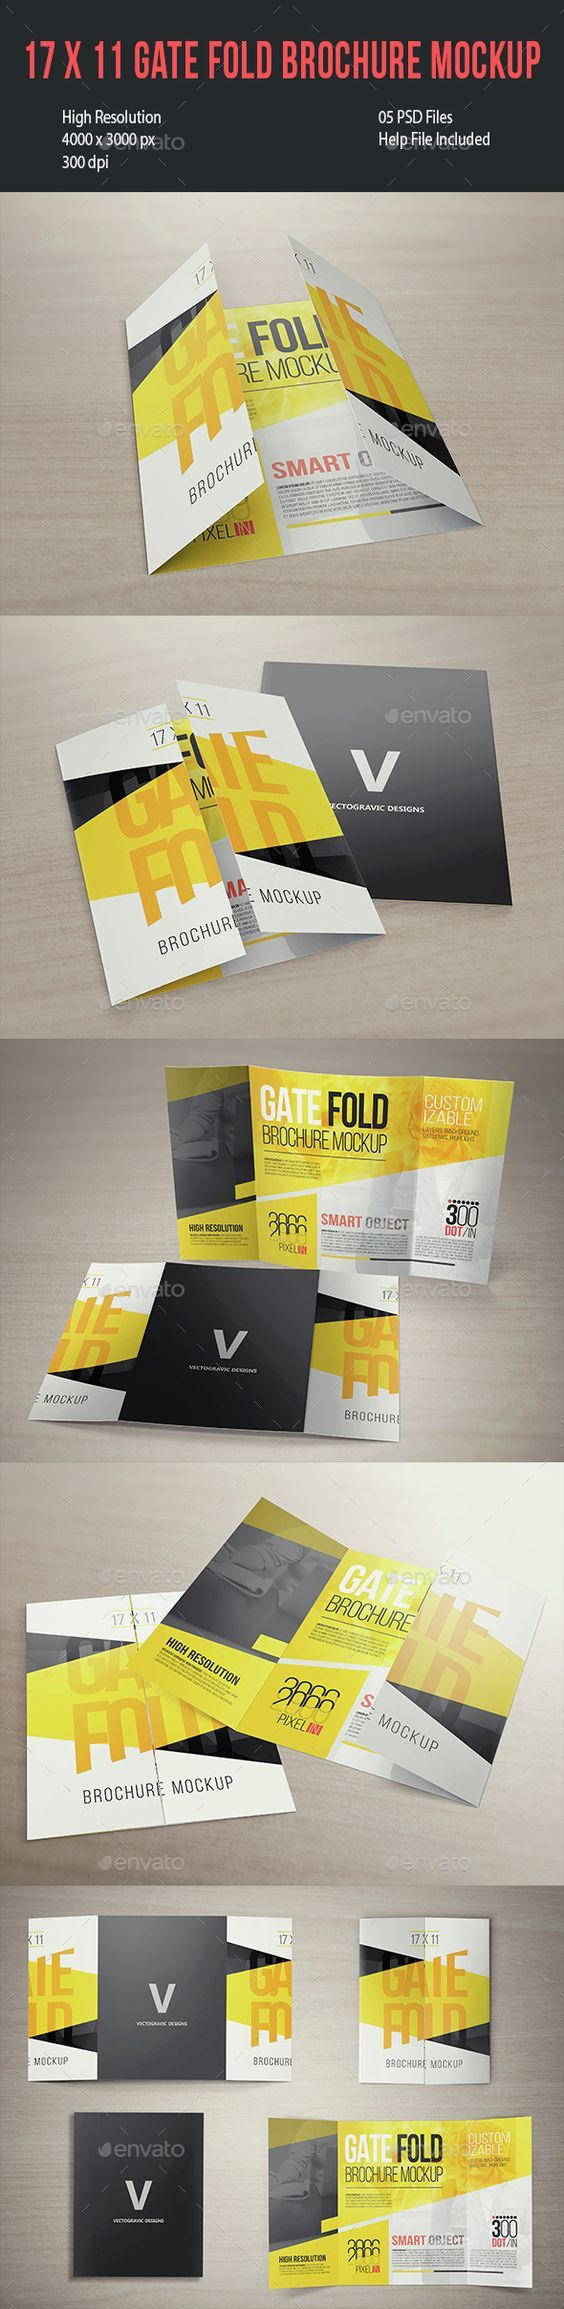 17 x 11 Gate Fold Brochure Mockup. Download here: http://graphicriver.net/item/17-x-11-gate-fold-brochure-mockup/15094144?ref=ksioks: